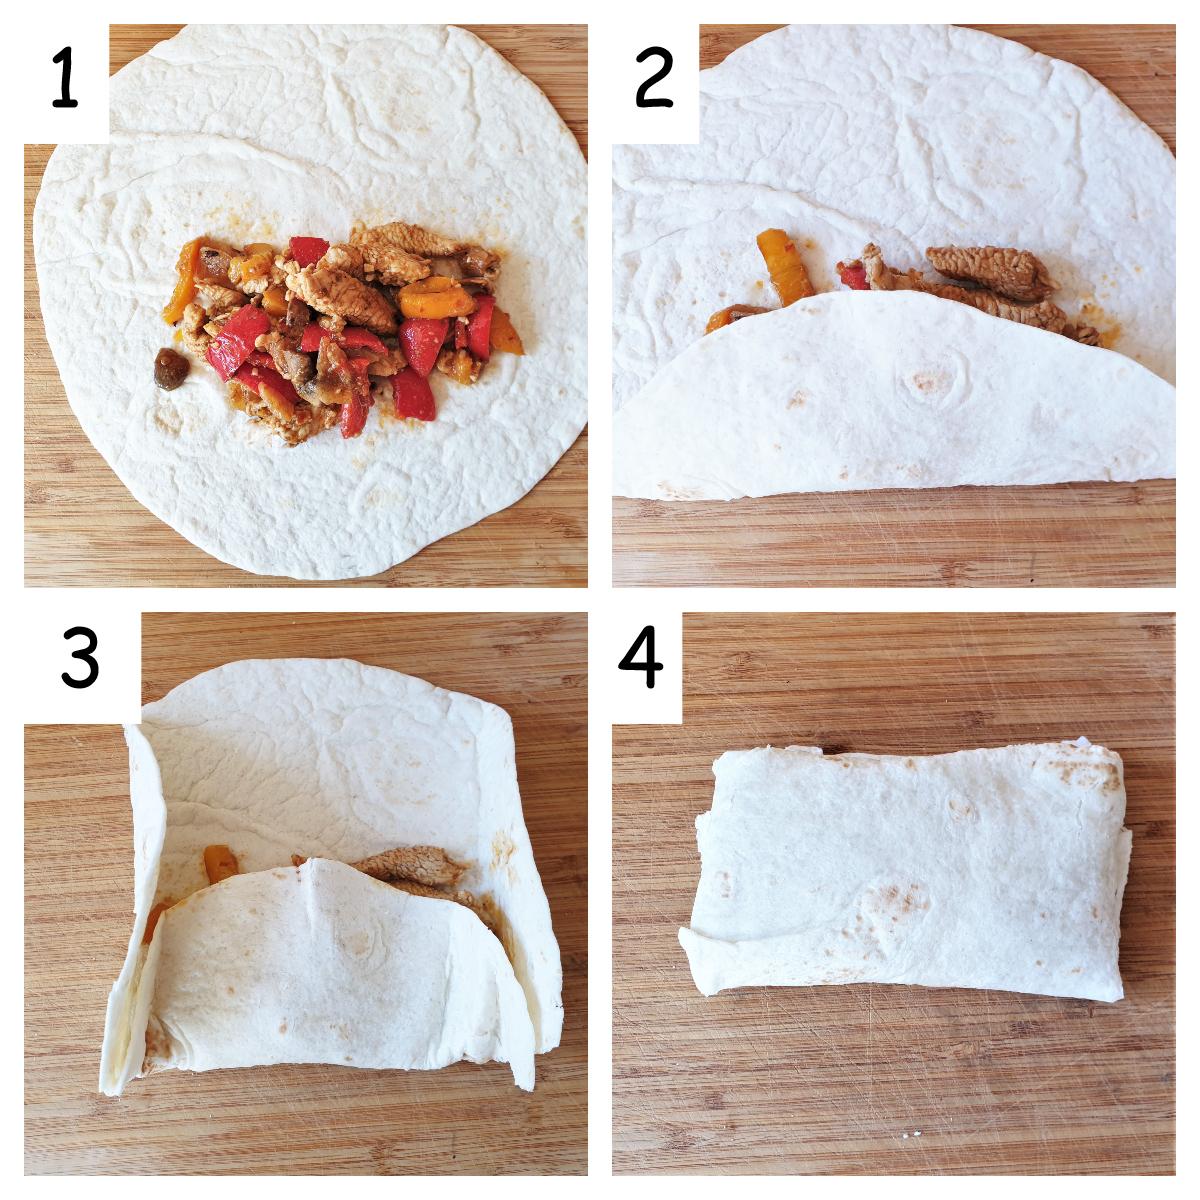 Collage showing steps for folding turkey fajitas.